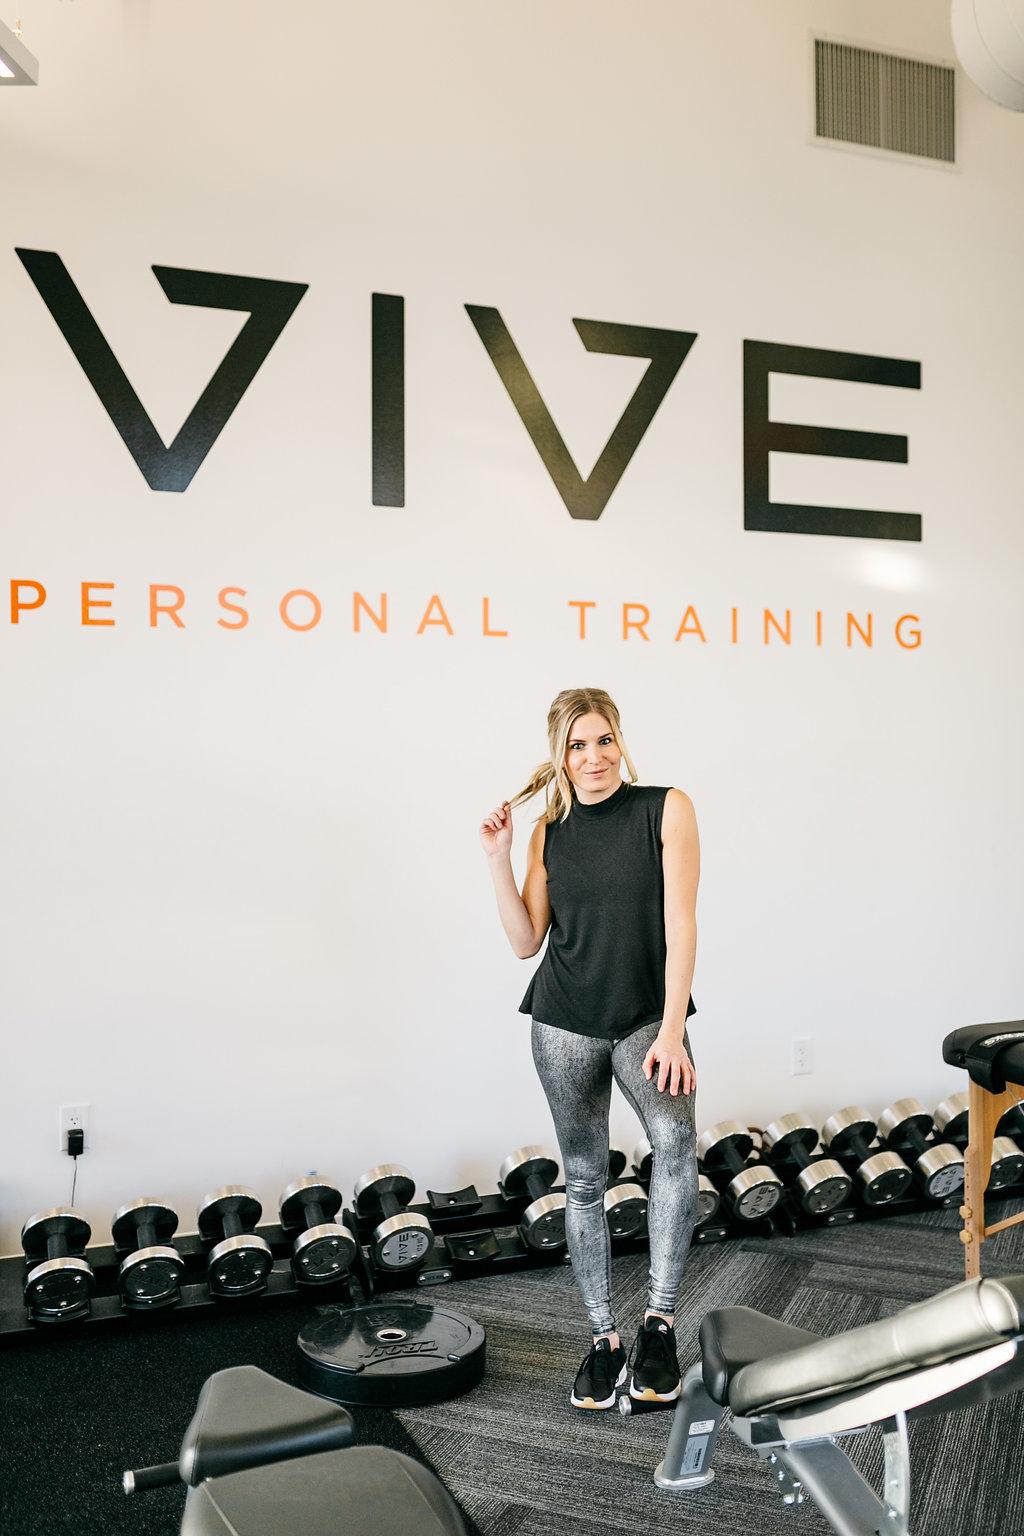 Vive Personal Training - Dallas workout studio